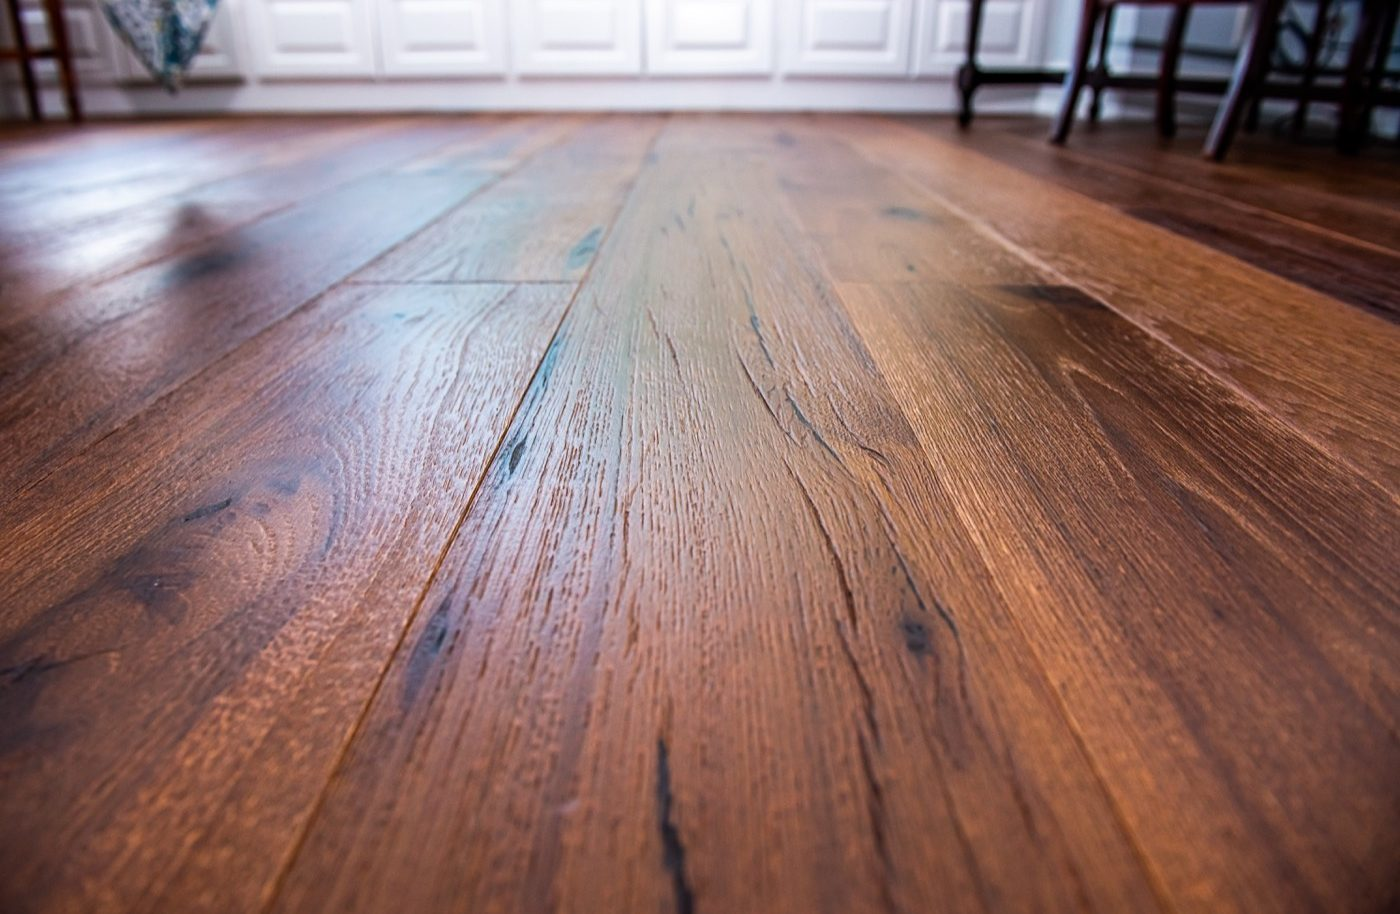 How To Clean Engineered Hardwood Flooring?